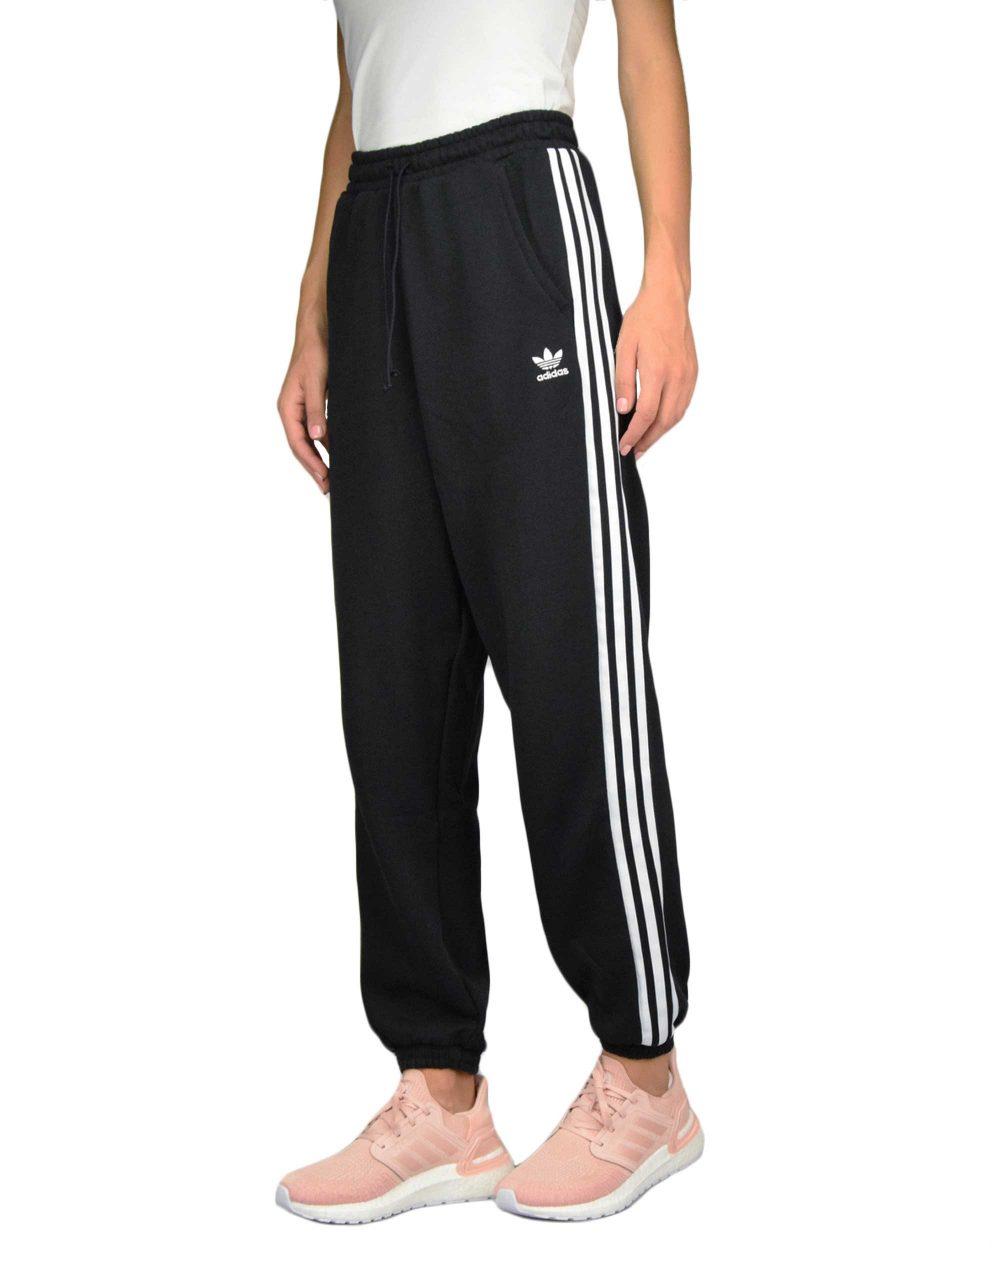 Adidas Jogger Pants (GD2260) Black